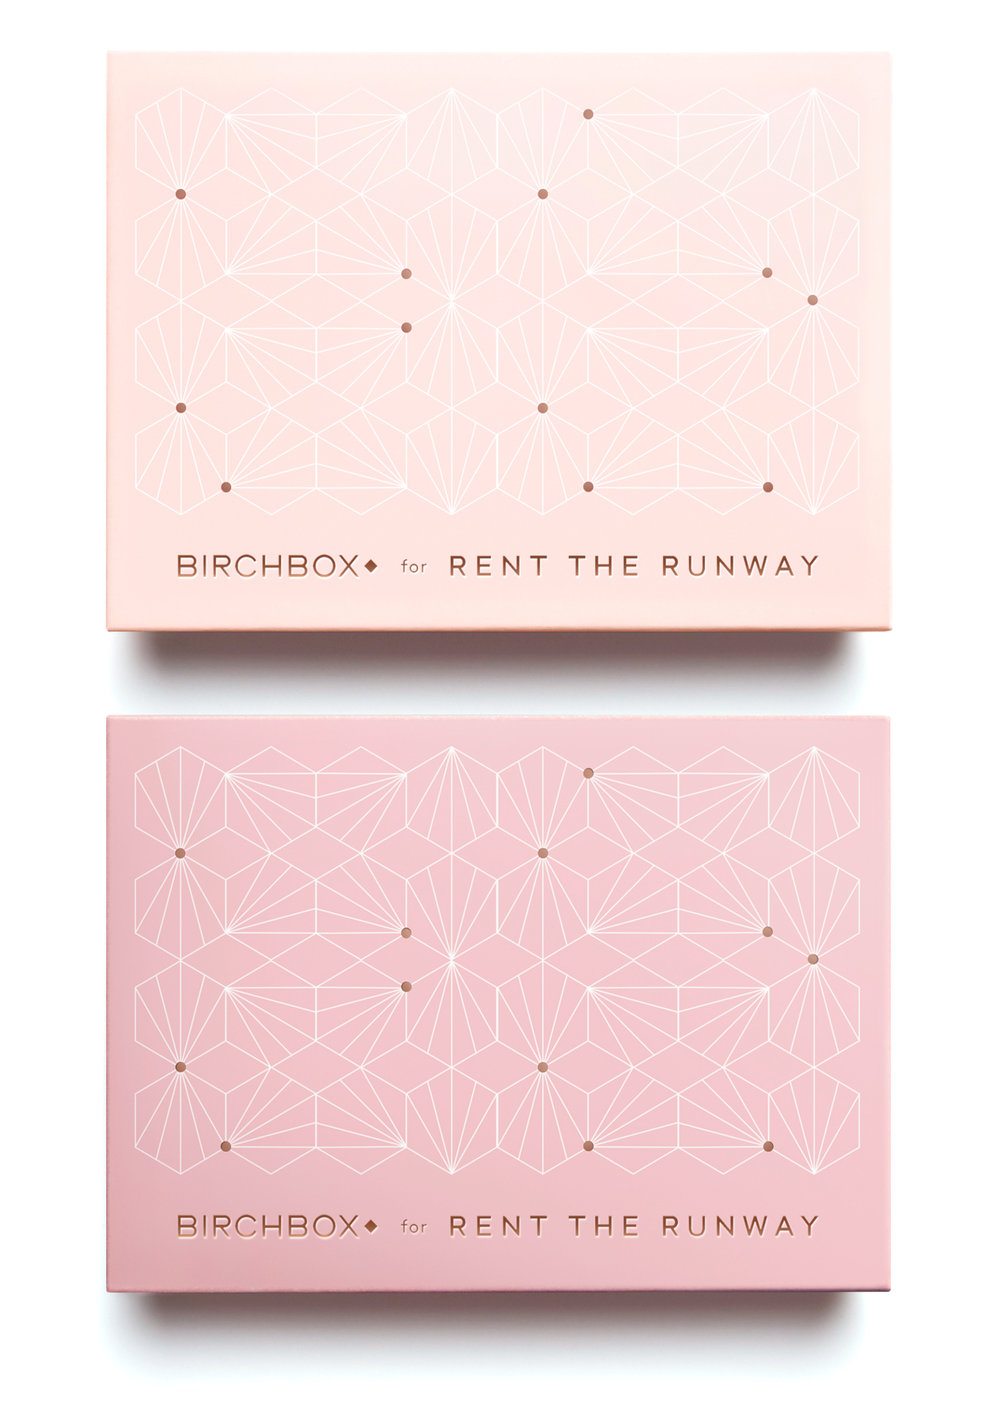 Birchbox for Rent the Runway